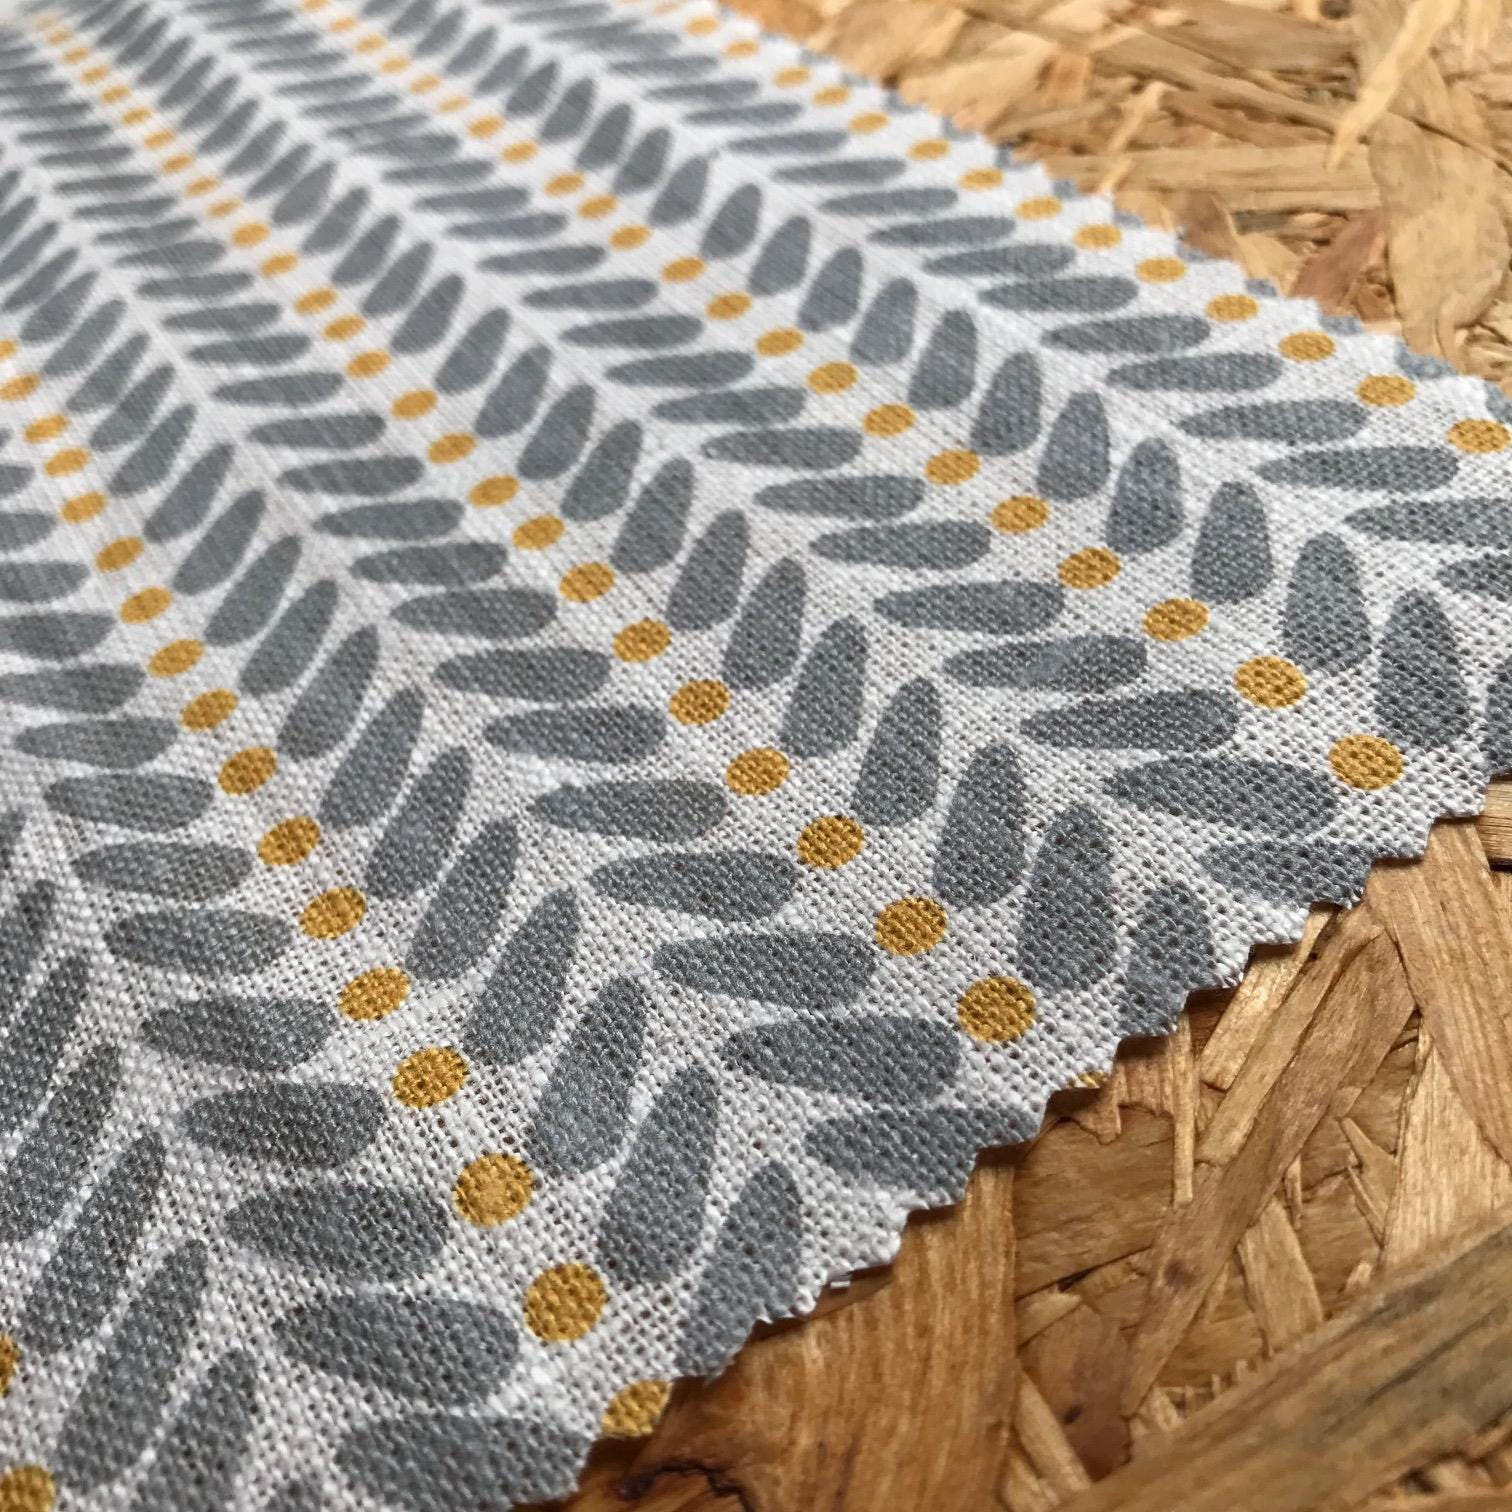 yellow and grey fabric curtain fabric scandinavian fabric. Black Bedroom Furniture Sets. Home Design Ideas